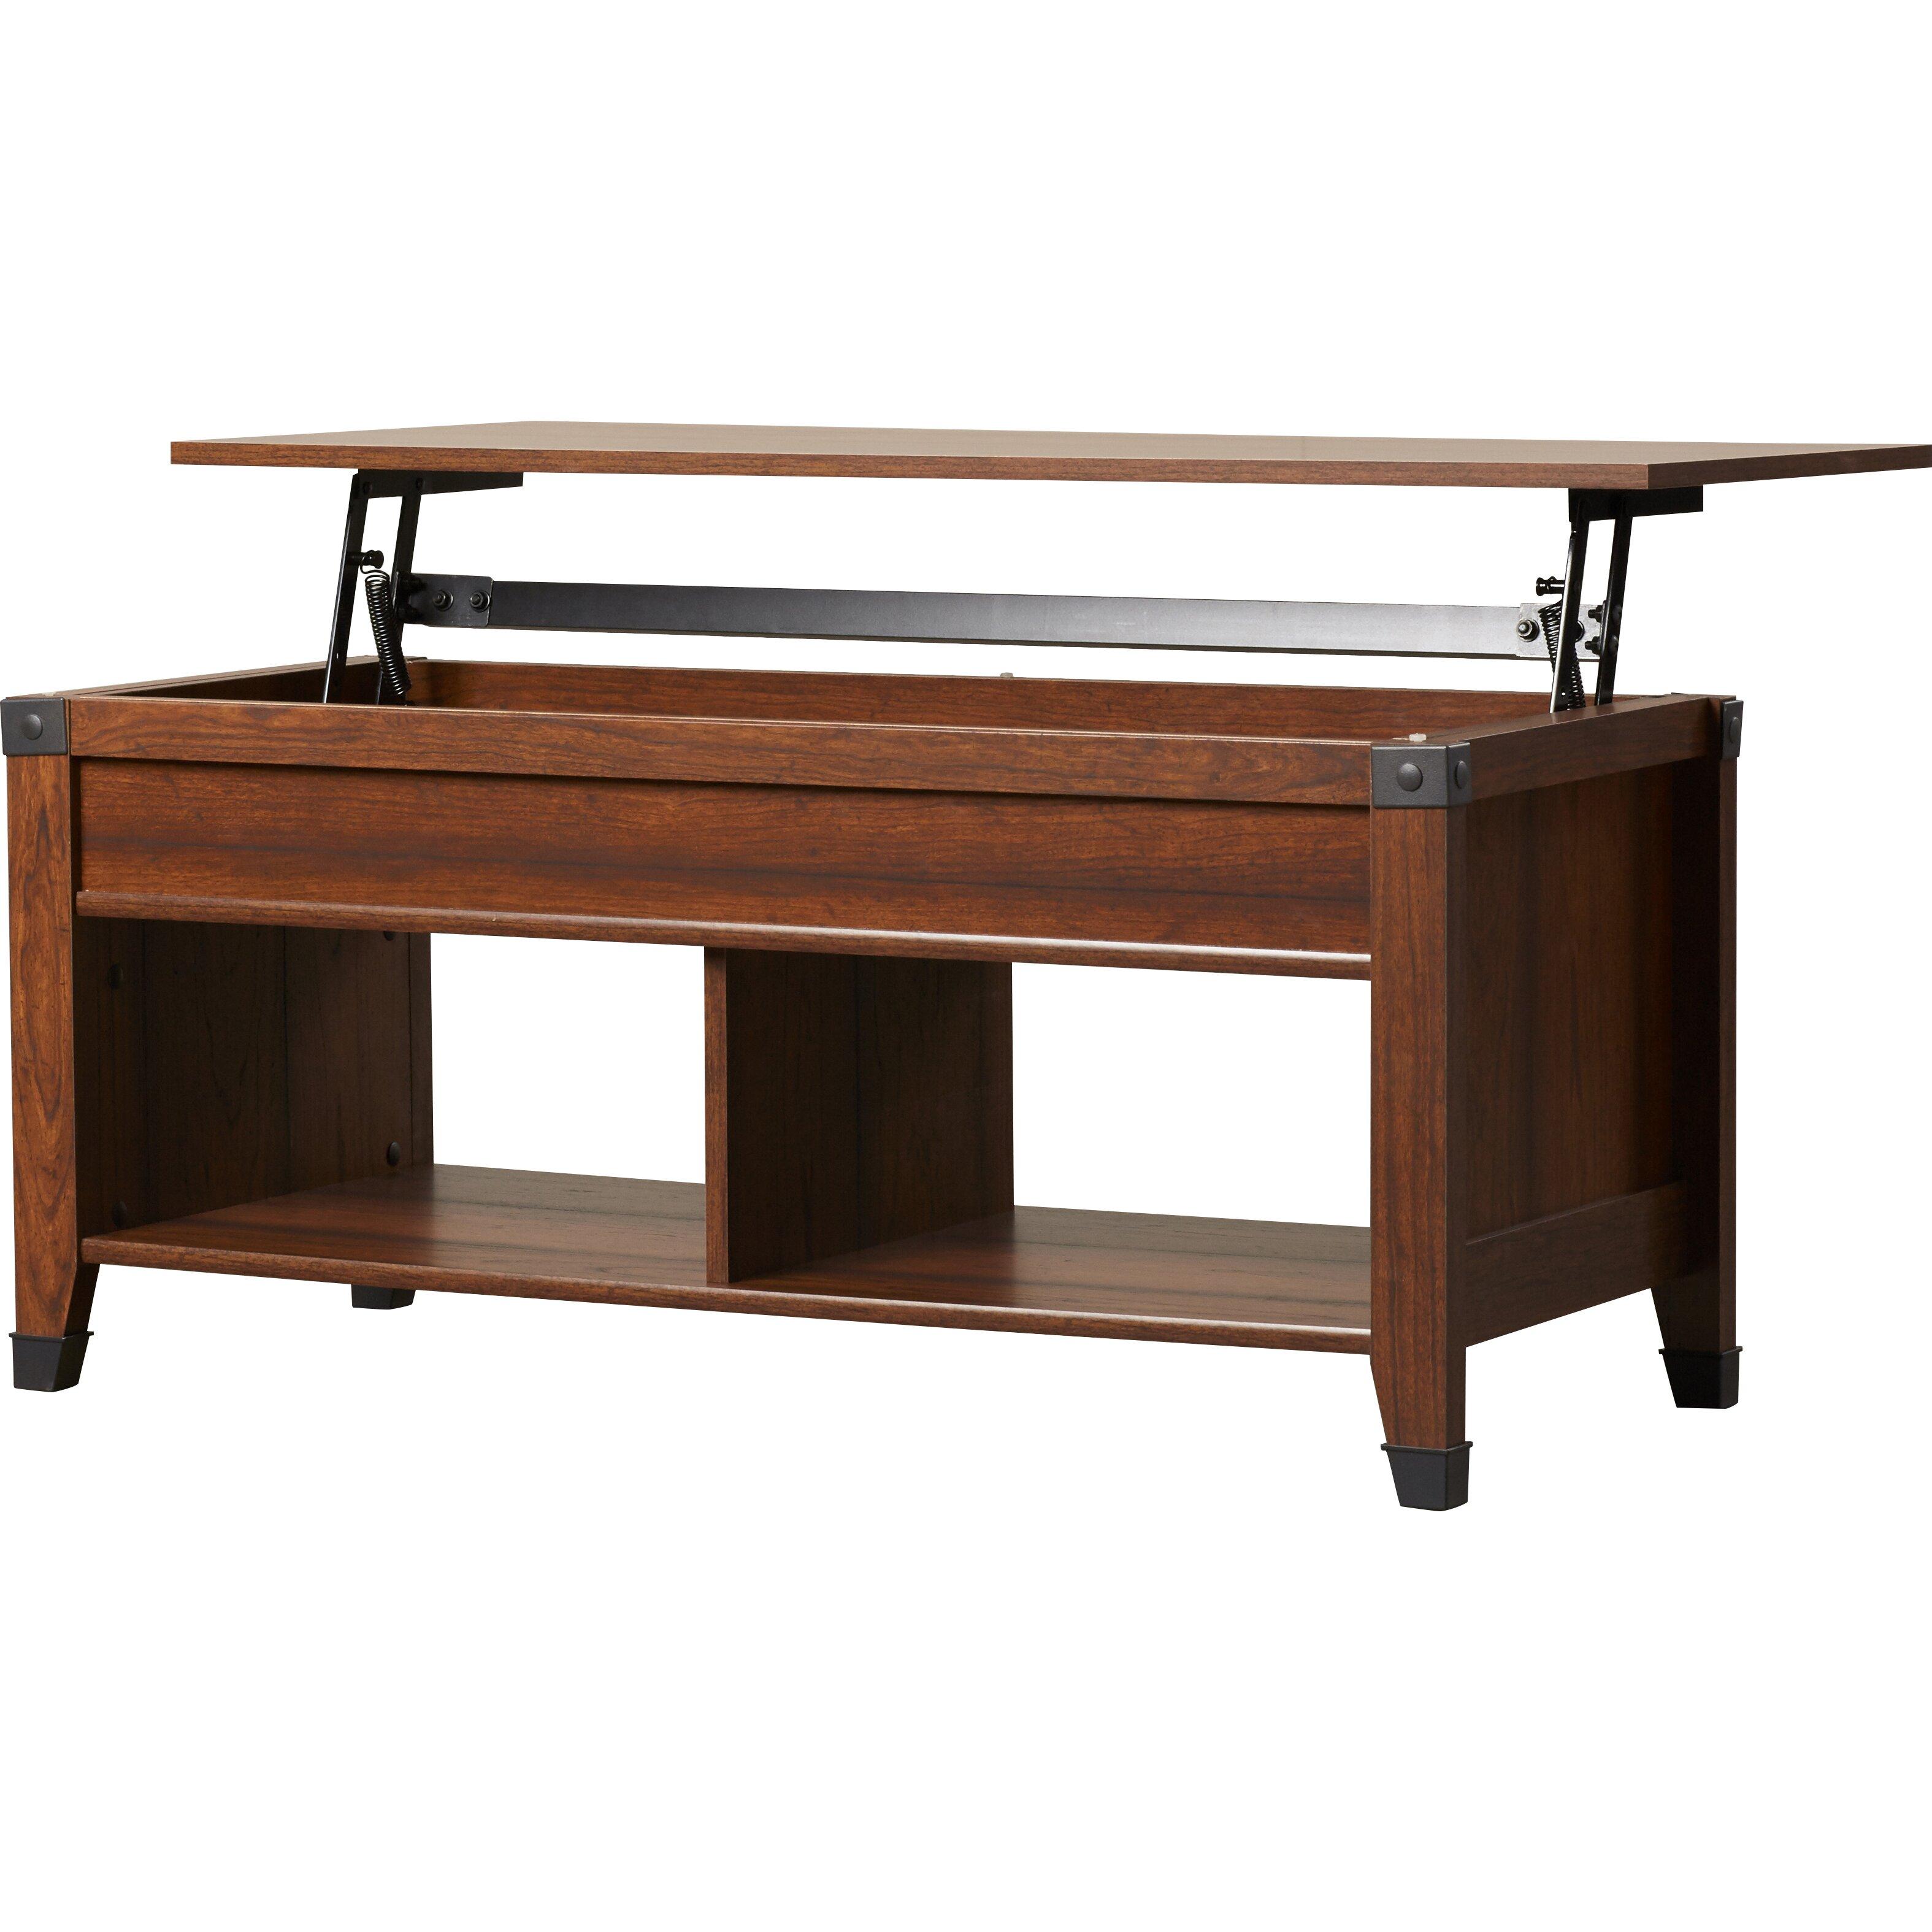 Loon Peak Newdale Coffee Table With Lift Top Reviews Wayfair